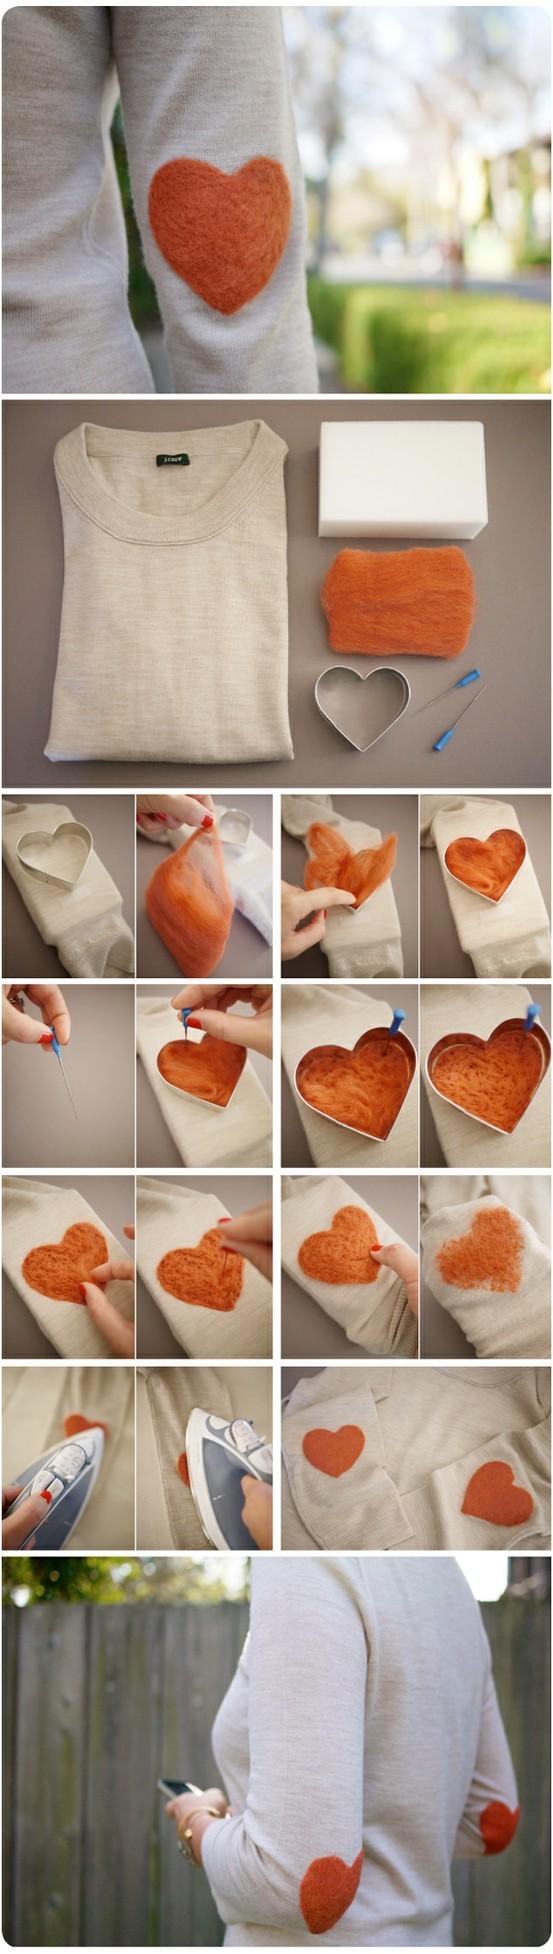 DIY: Chaleco con aplicación de corazón